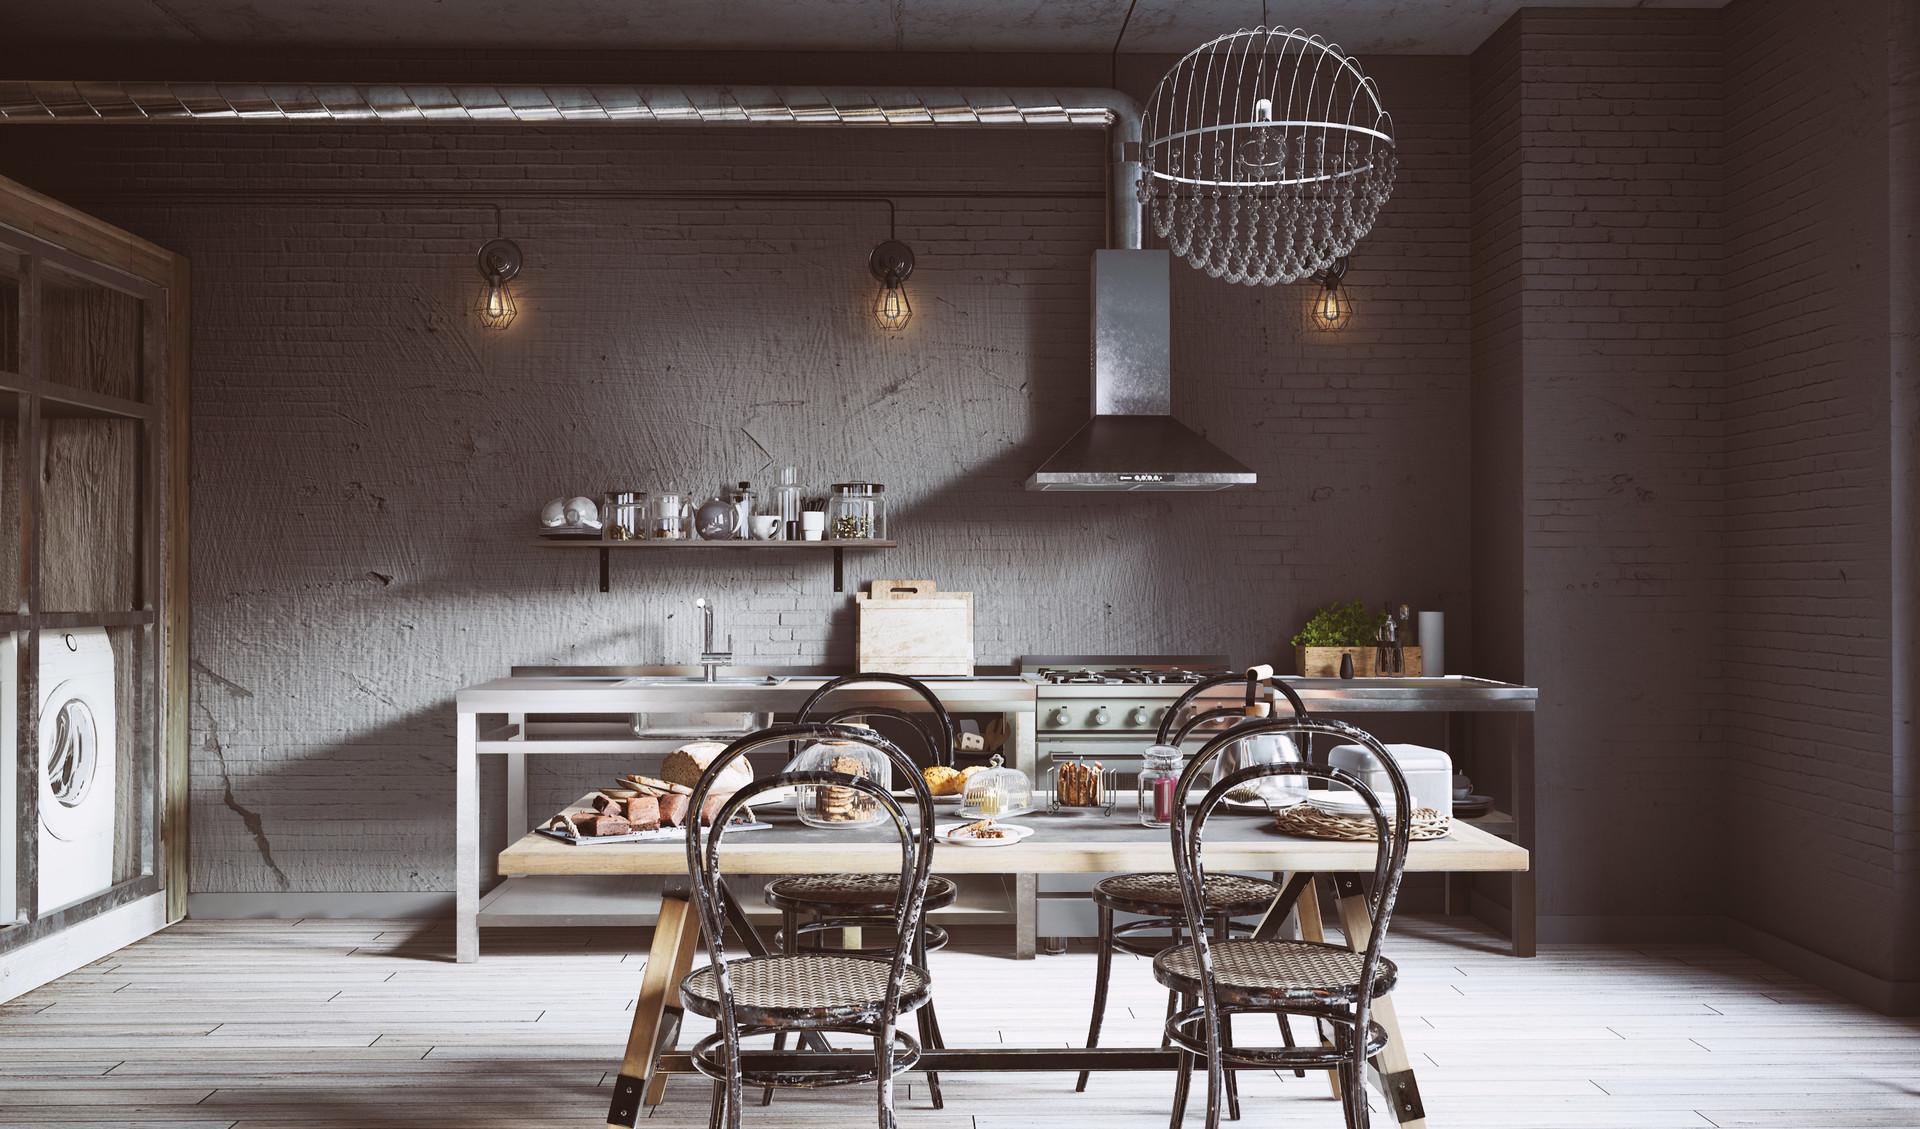 ArtStation - UE4 Archviz - Apartment 2018, David Baylis